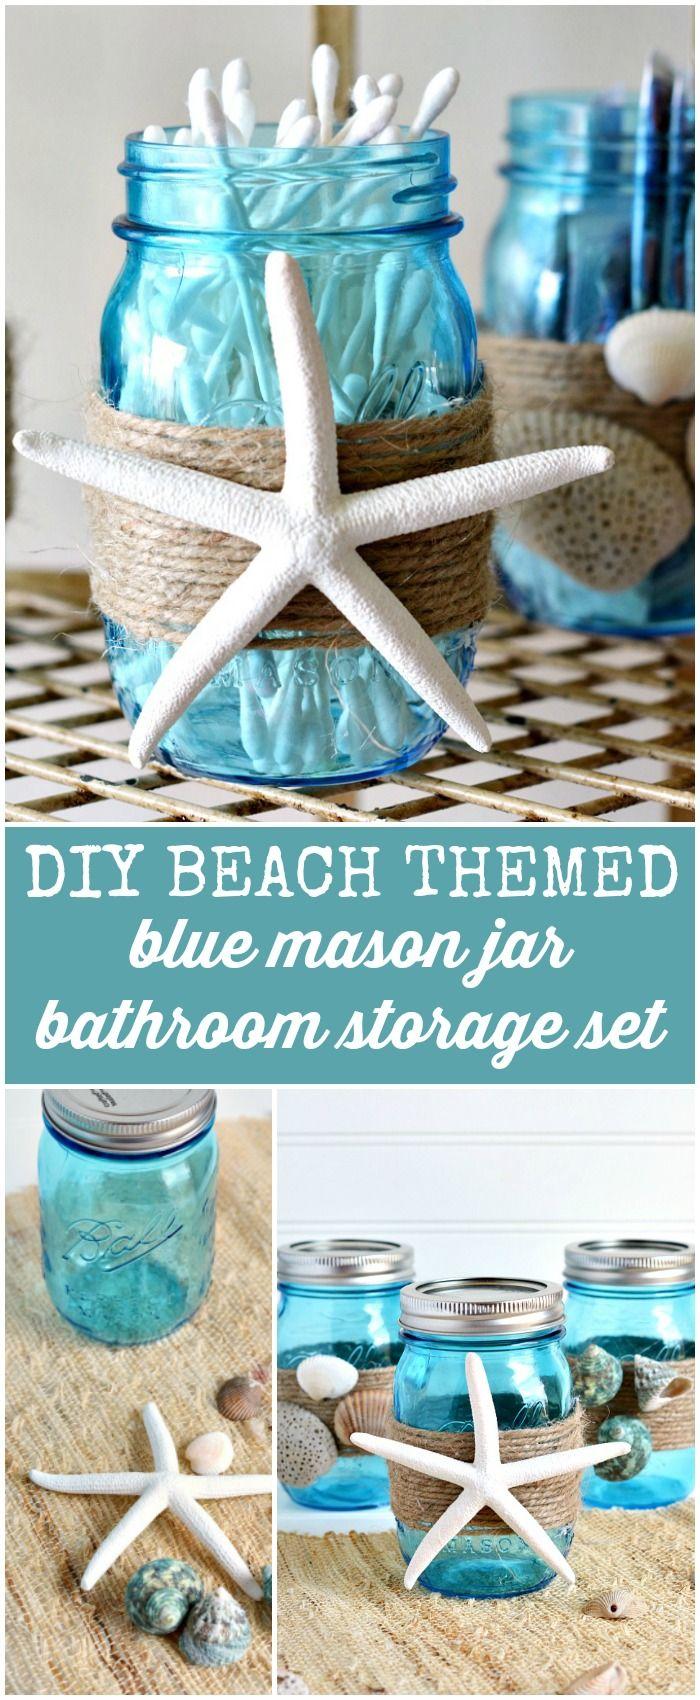 Little mermaid bathroom accessories - How To Make A Diy Beach Themed Blue Ball Mason Jar Bathroom Storage Set